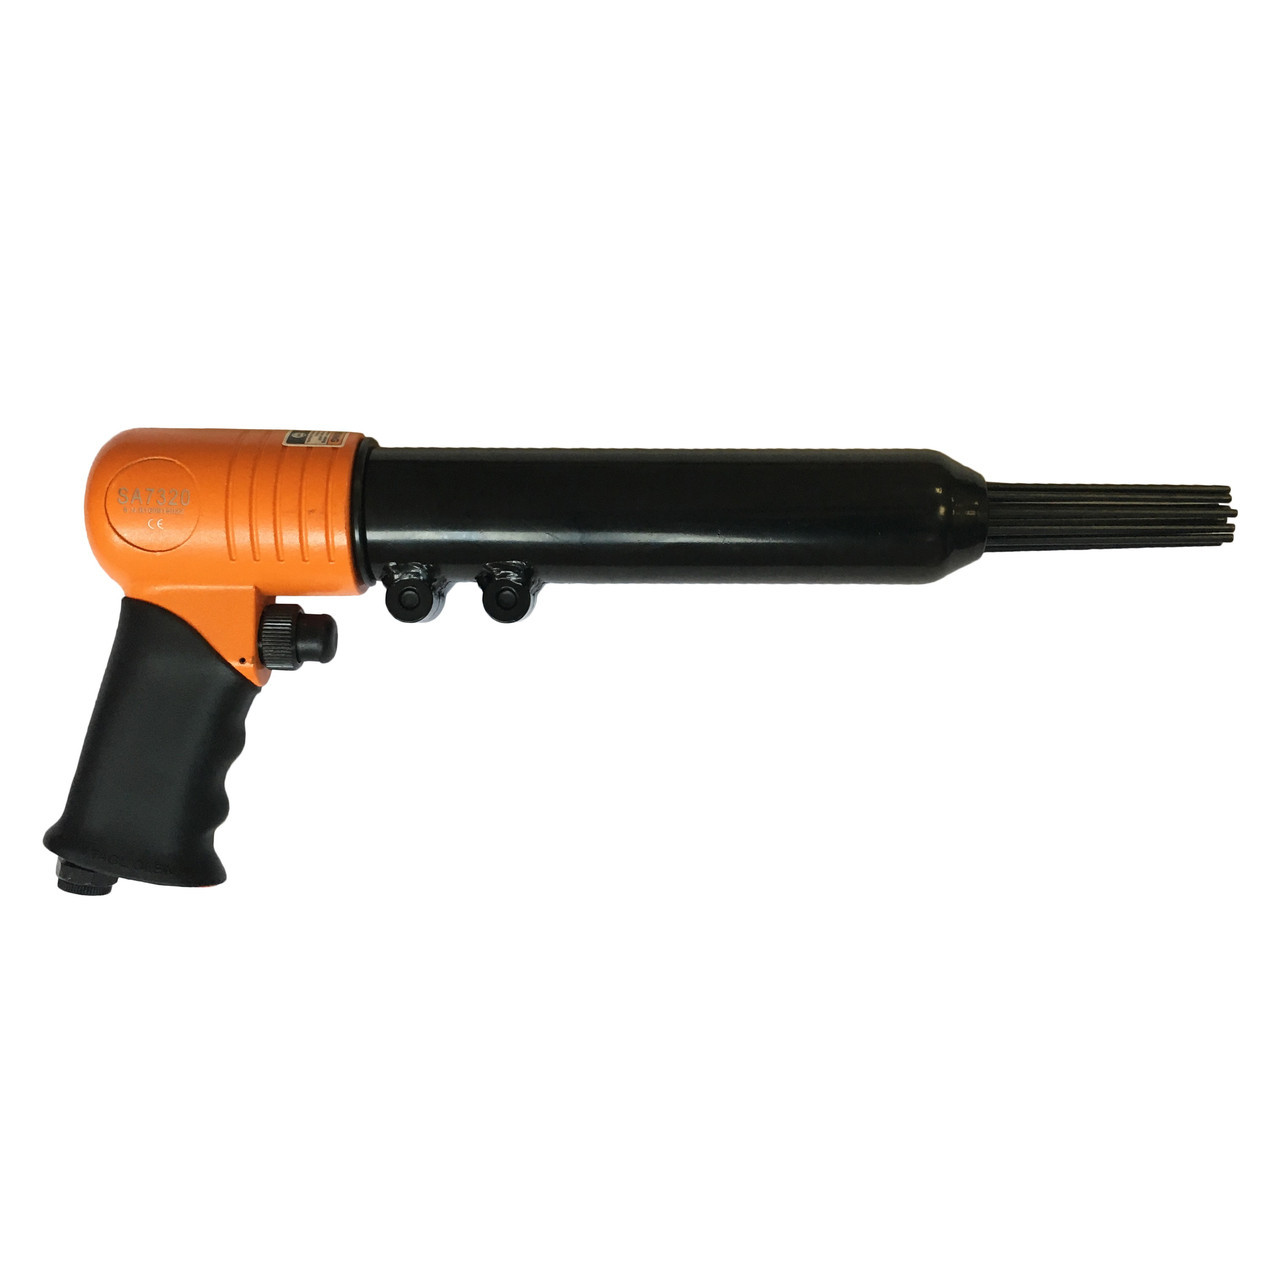 Молоток игольчатый пневматический пистолетного типа Air Pro SA7320 (Тайвань)